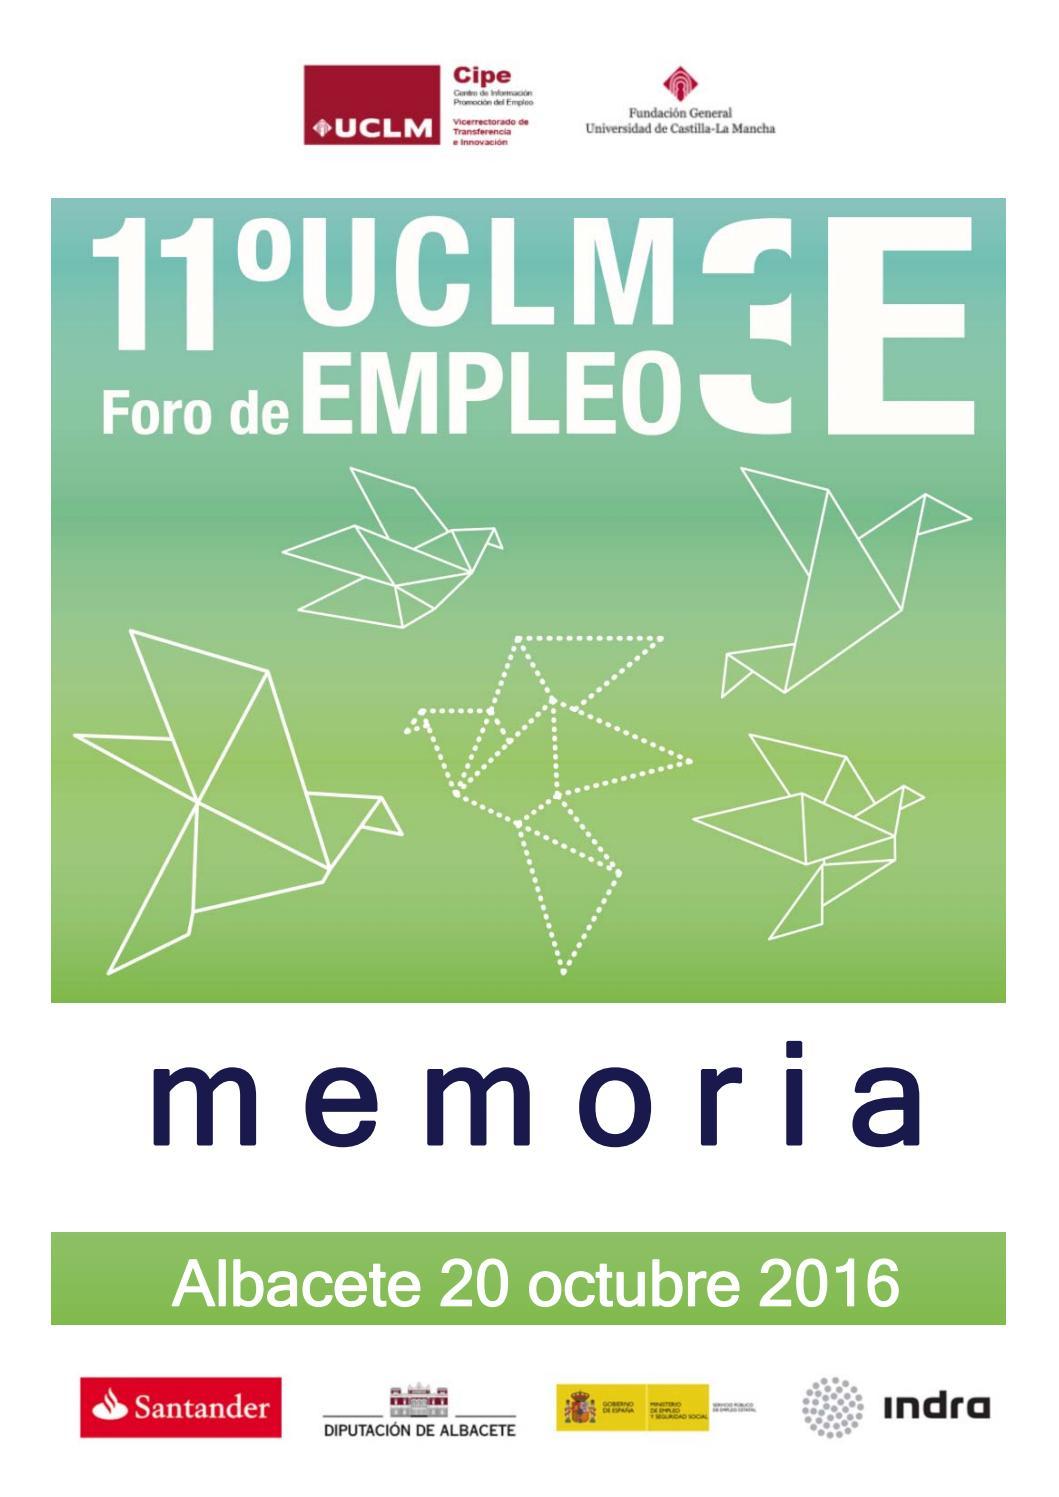 Memoria 11º foro de empleo UCLM3E / año 2016 by CIPE-UCLM - issuu